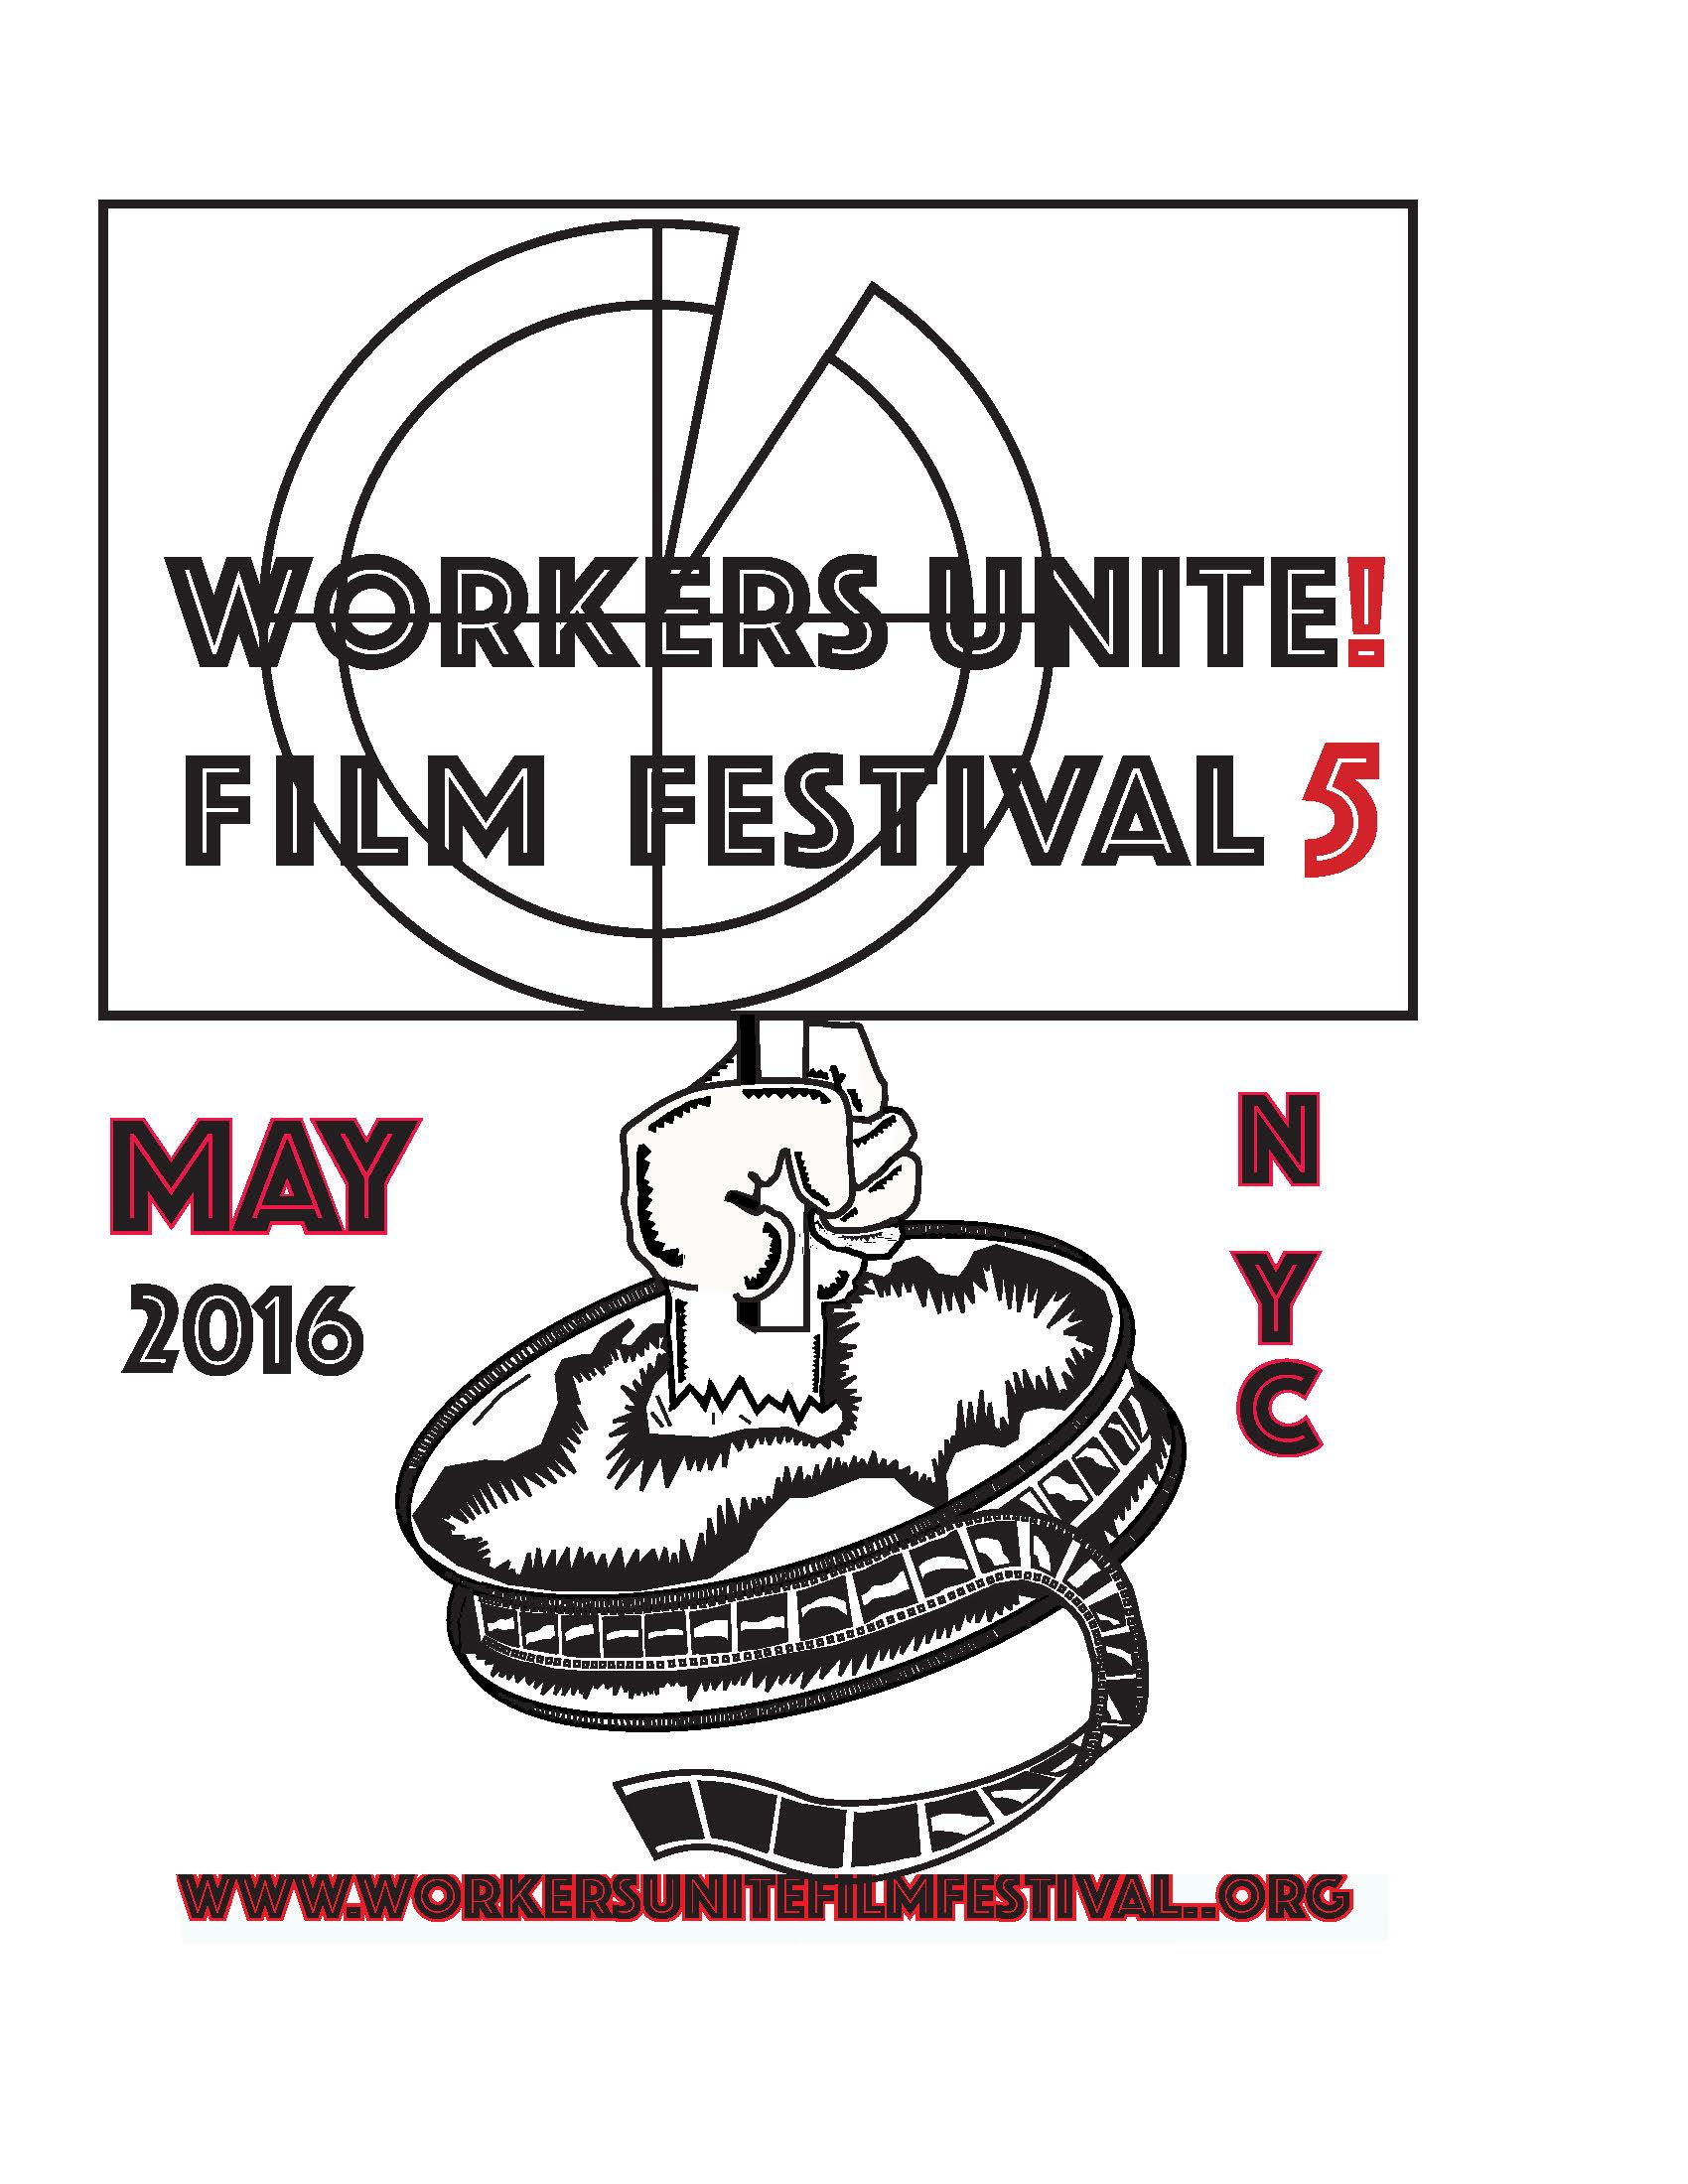 Workers Unite Film Festival 5 logo